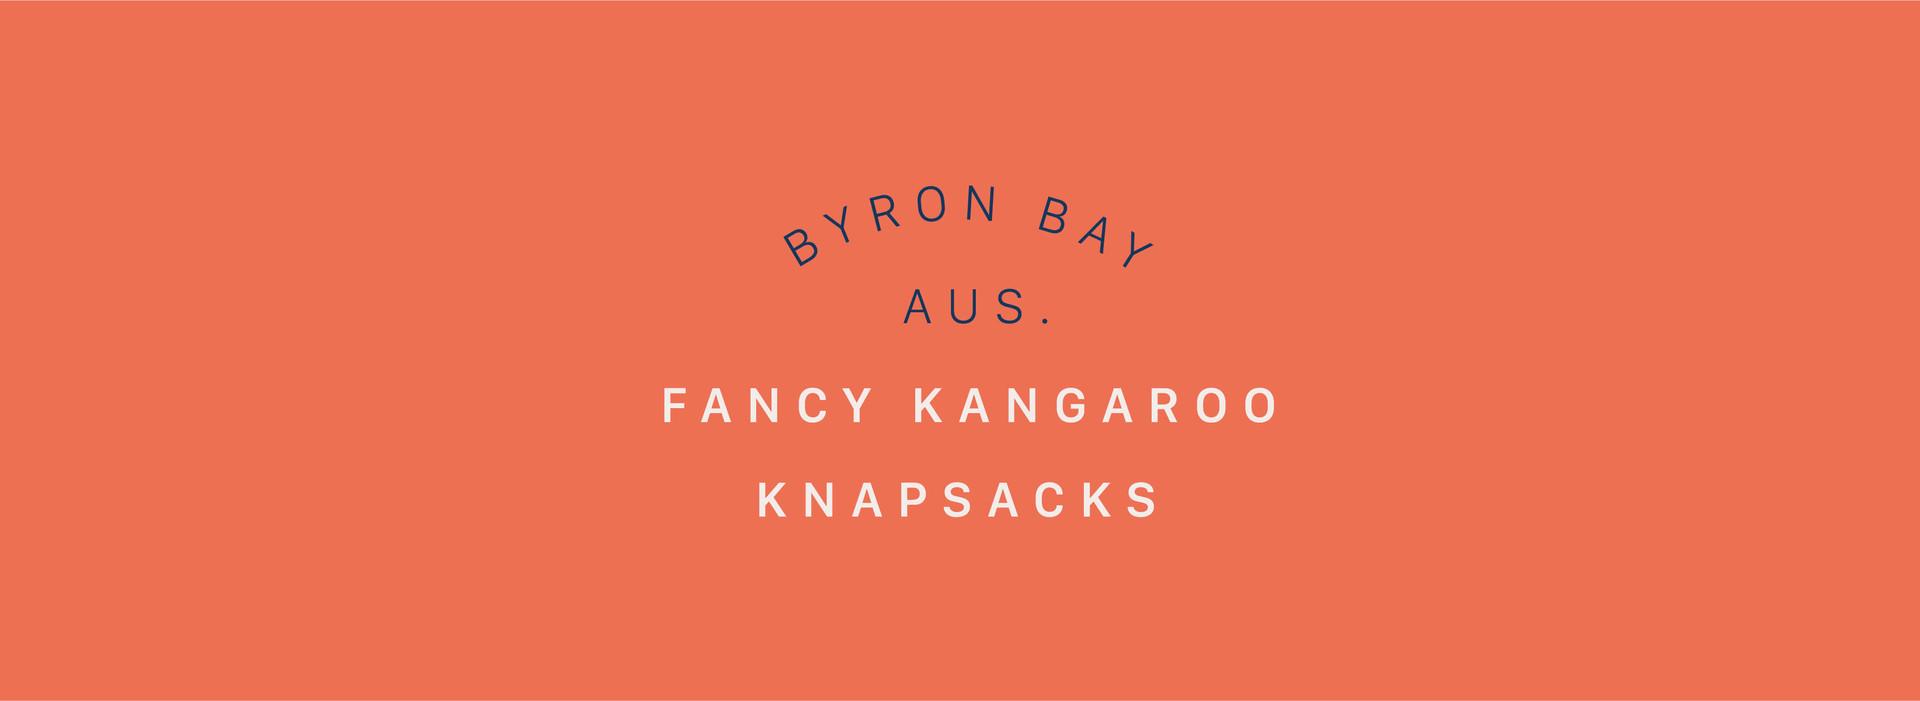 FancyKangaroo-BrandingBoard-02 [Recovere